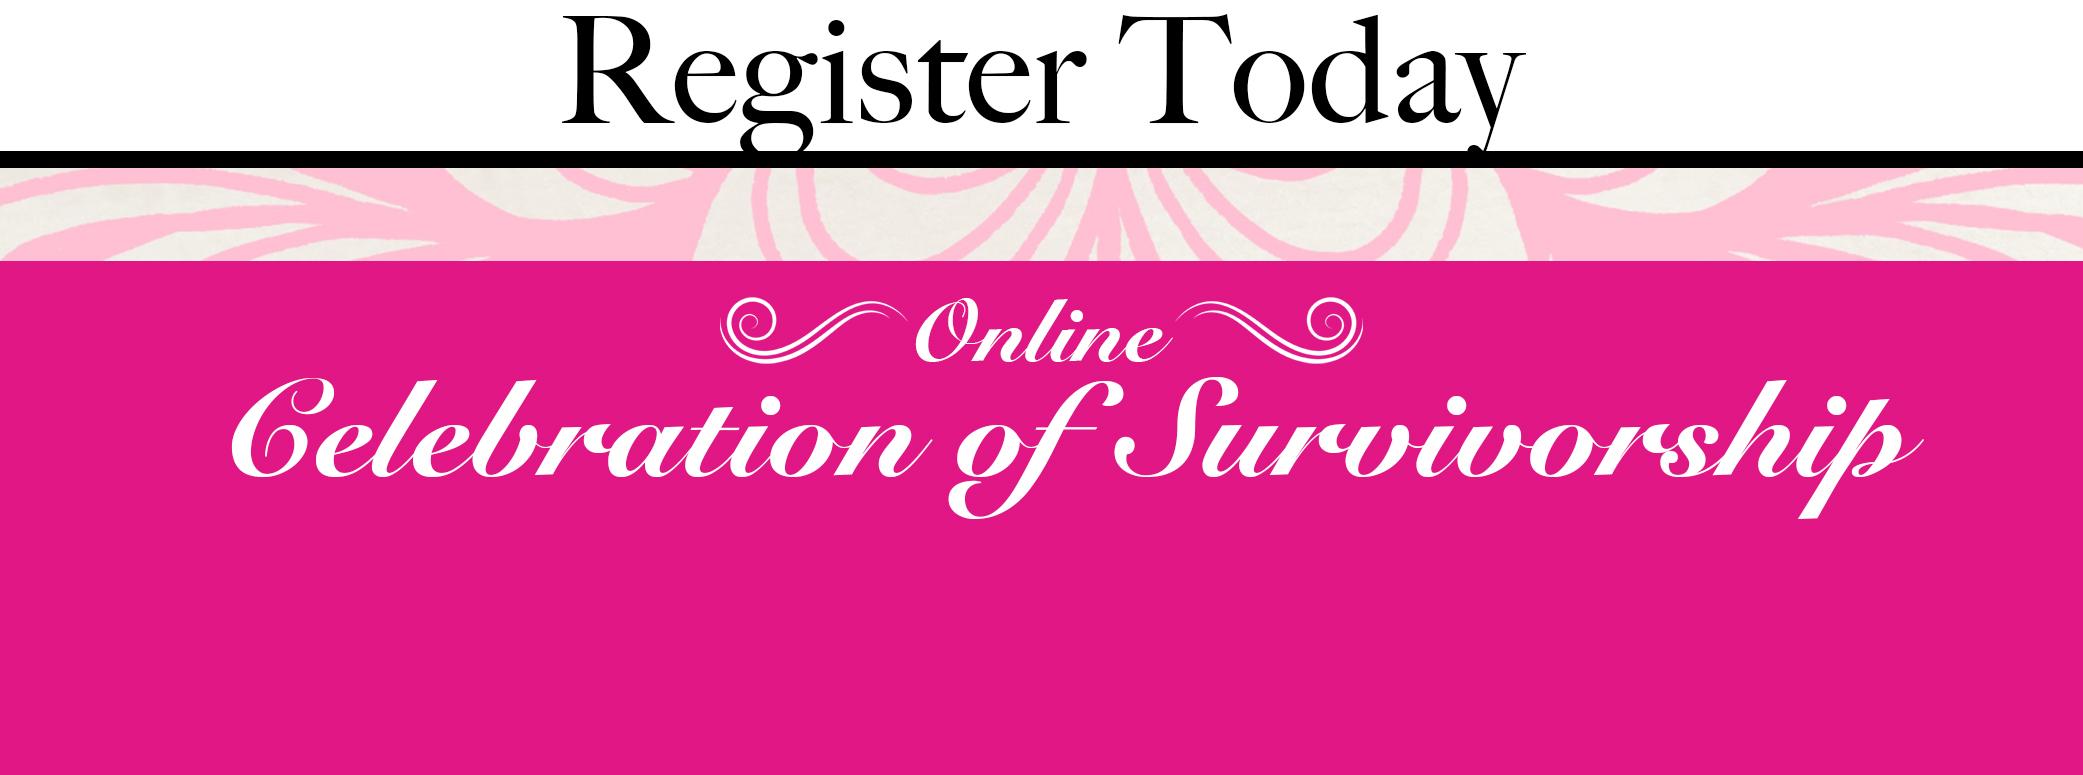 Celebration_register today_2021